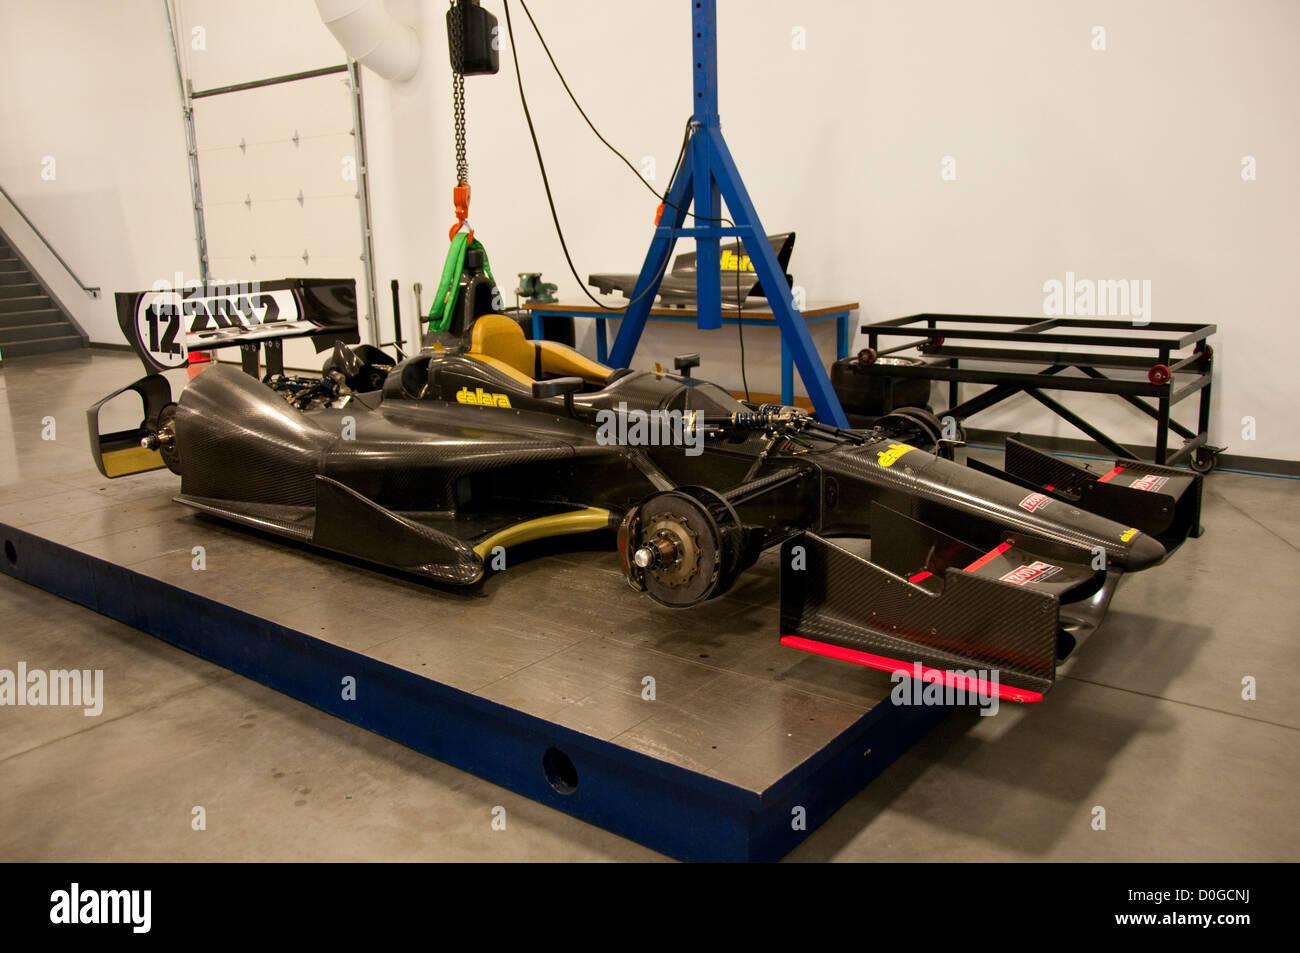 USA, Indiana, Indianapolis Motor Speedway, Indy 500 car under construction at Dellara car manufacturing facility. Stock Photo